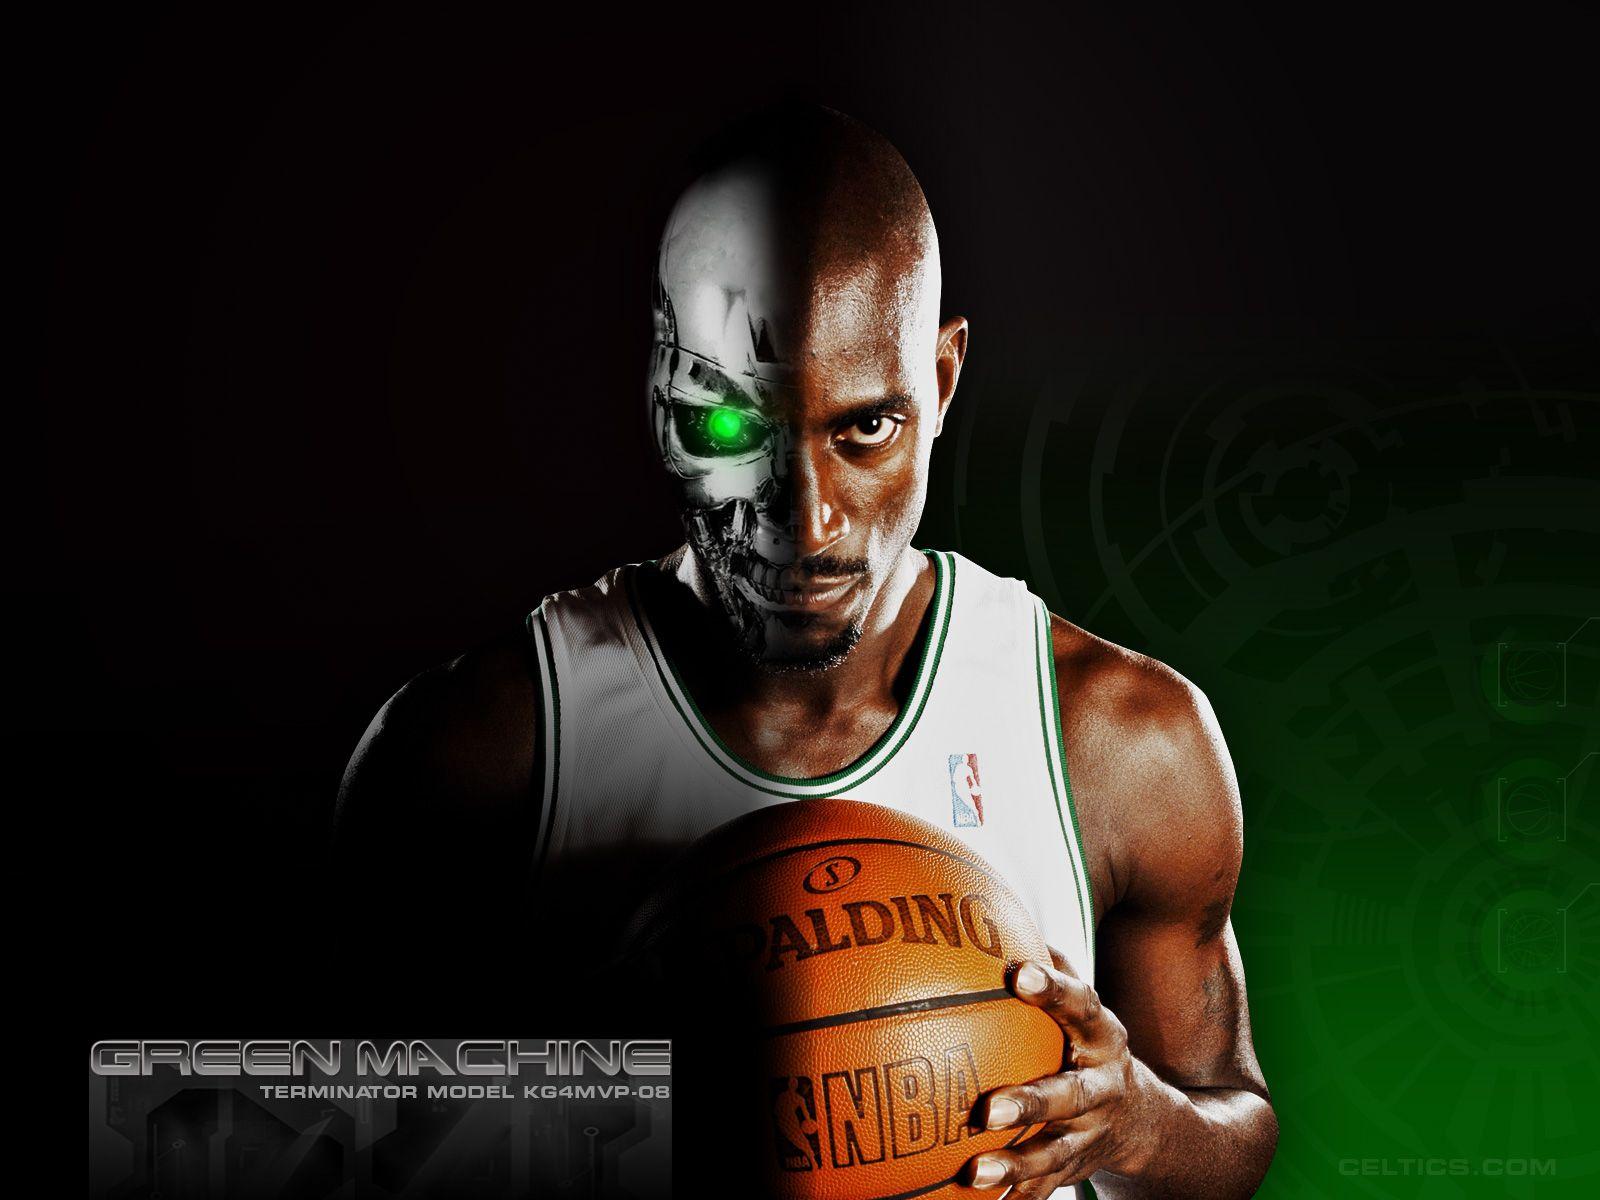 Nba Wallpaper Desktop Basketball Wallpapers Nba Wallpapers